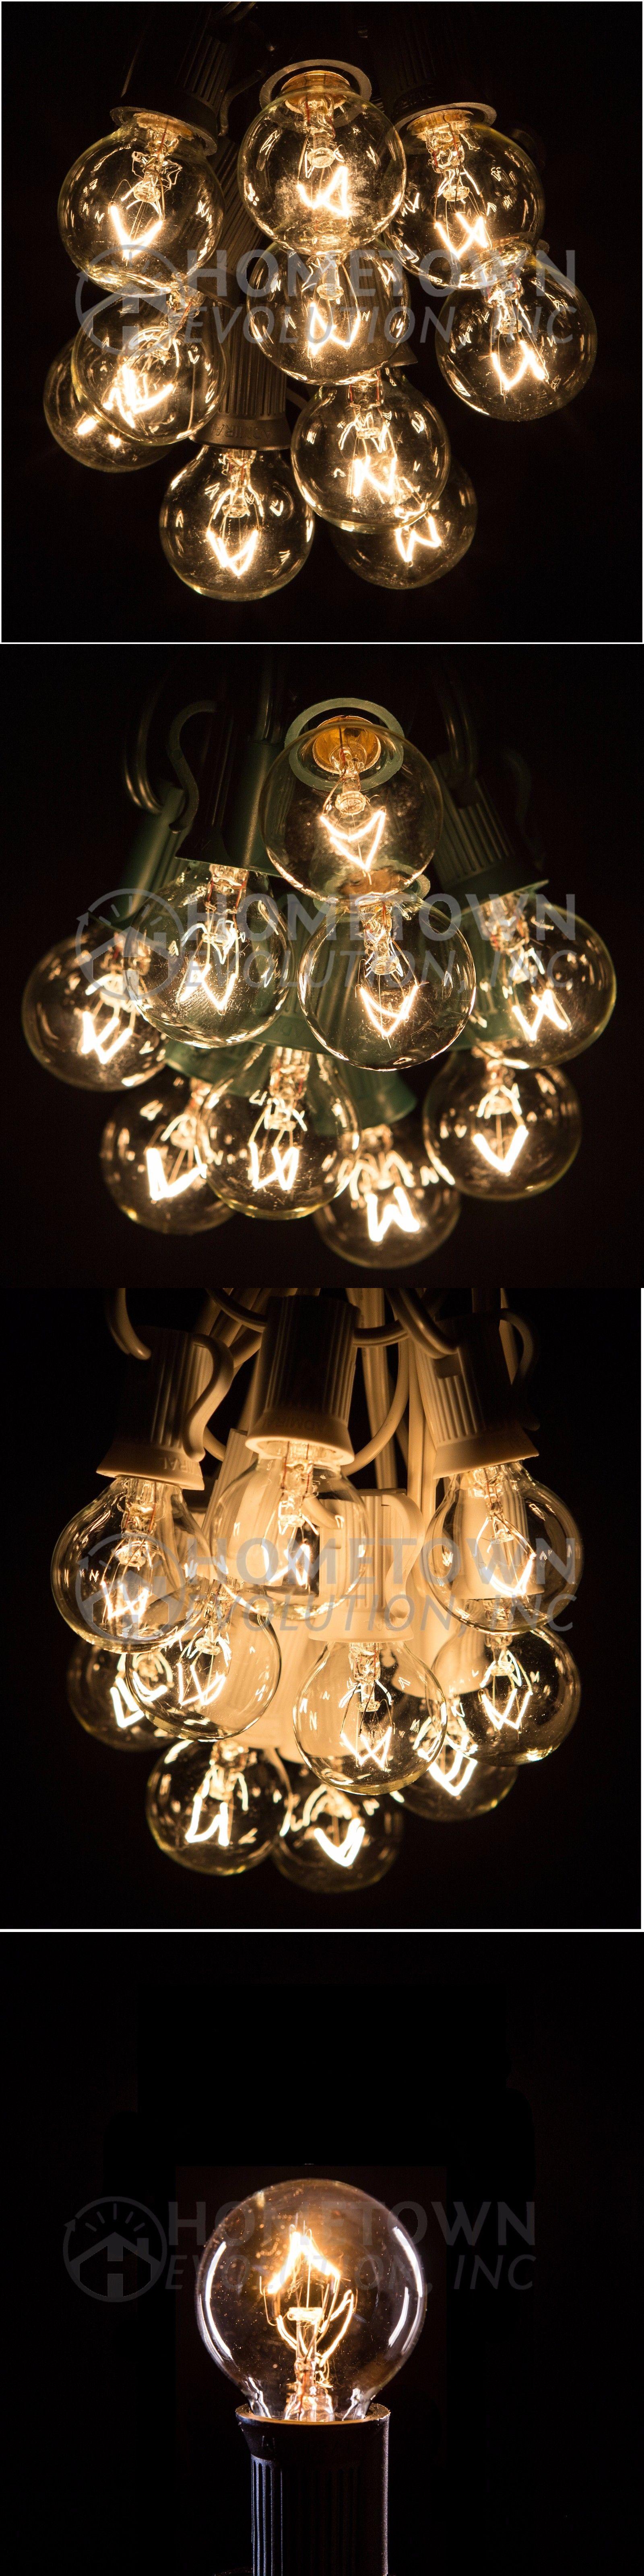 Outdoor String Lights 183394: 100 Foot Outdoor Globe Patio String Lights    Set Of 100